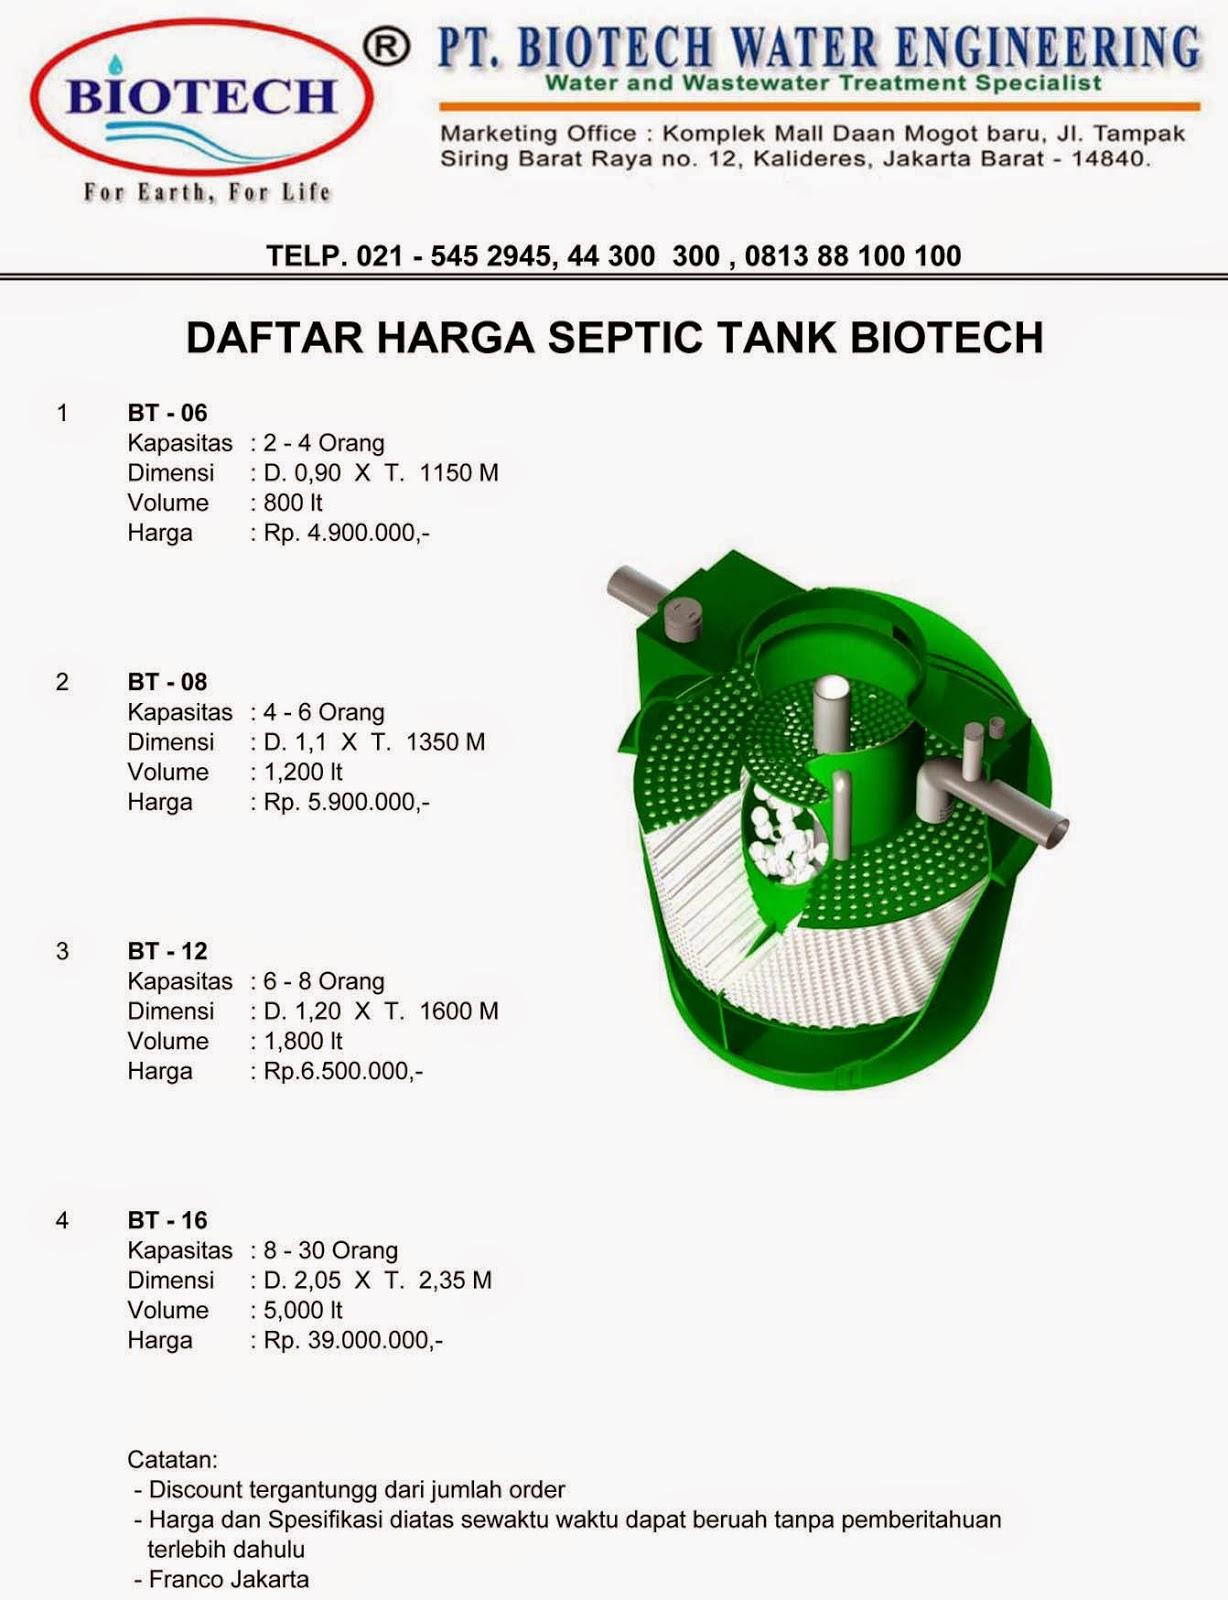 daftar harga septic tank biotech bt series, price list spiteng biotek, jual, biofive, biogift